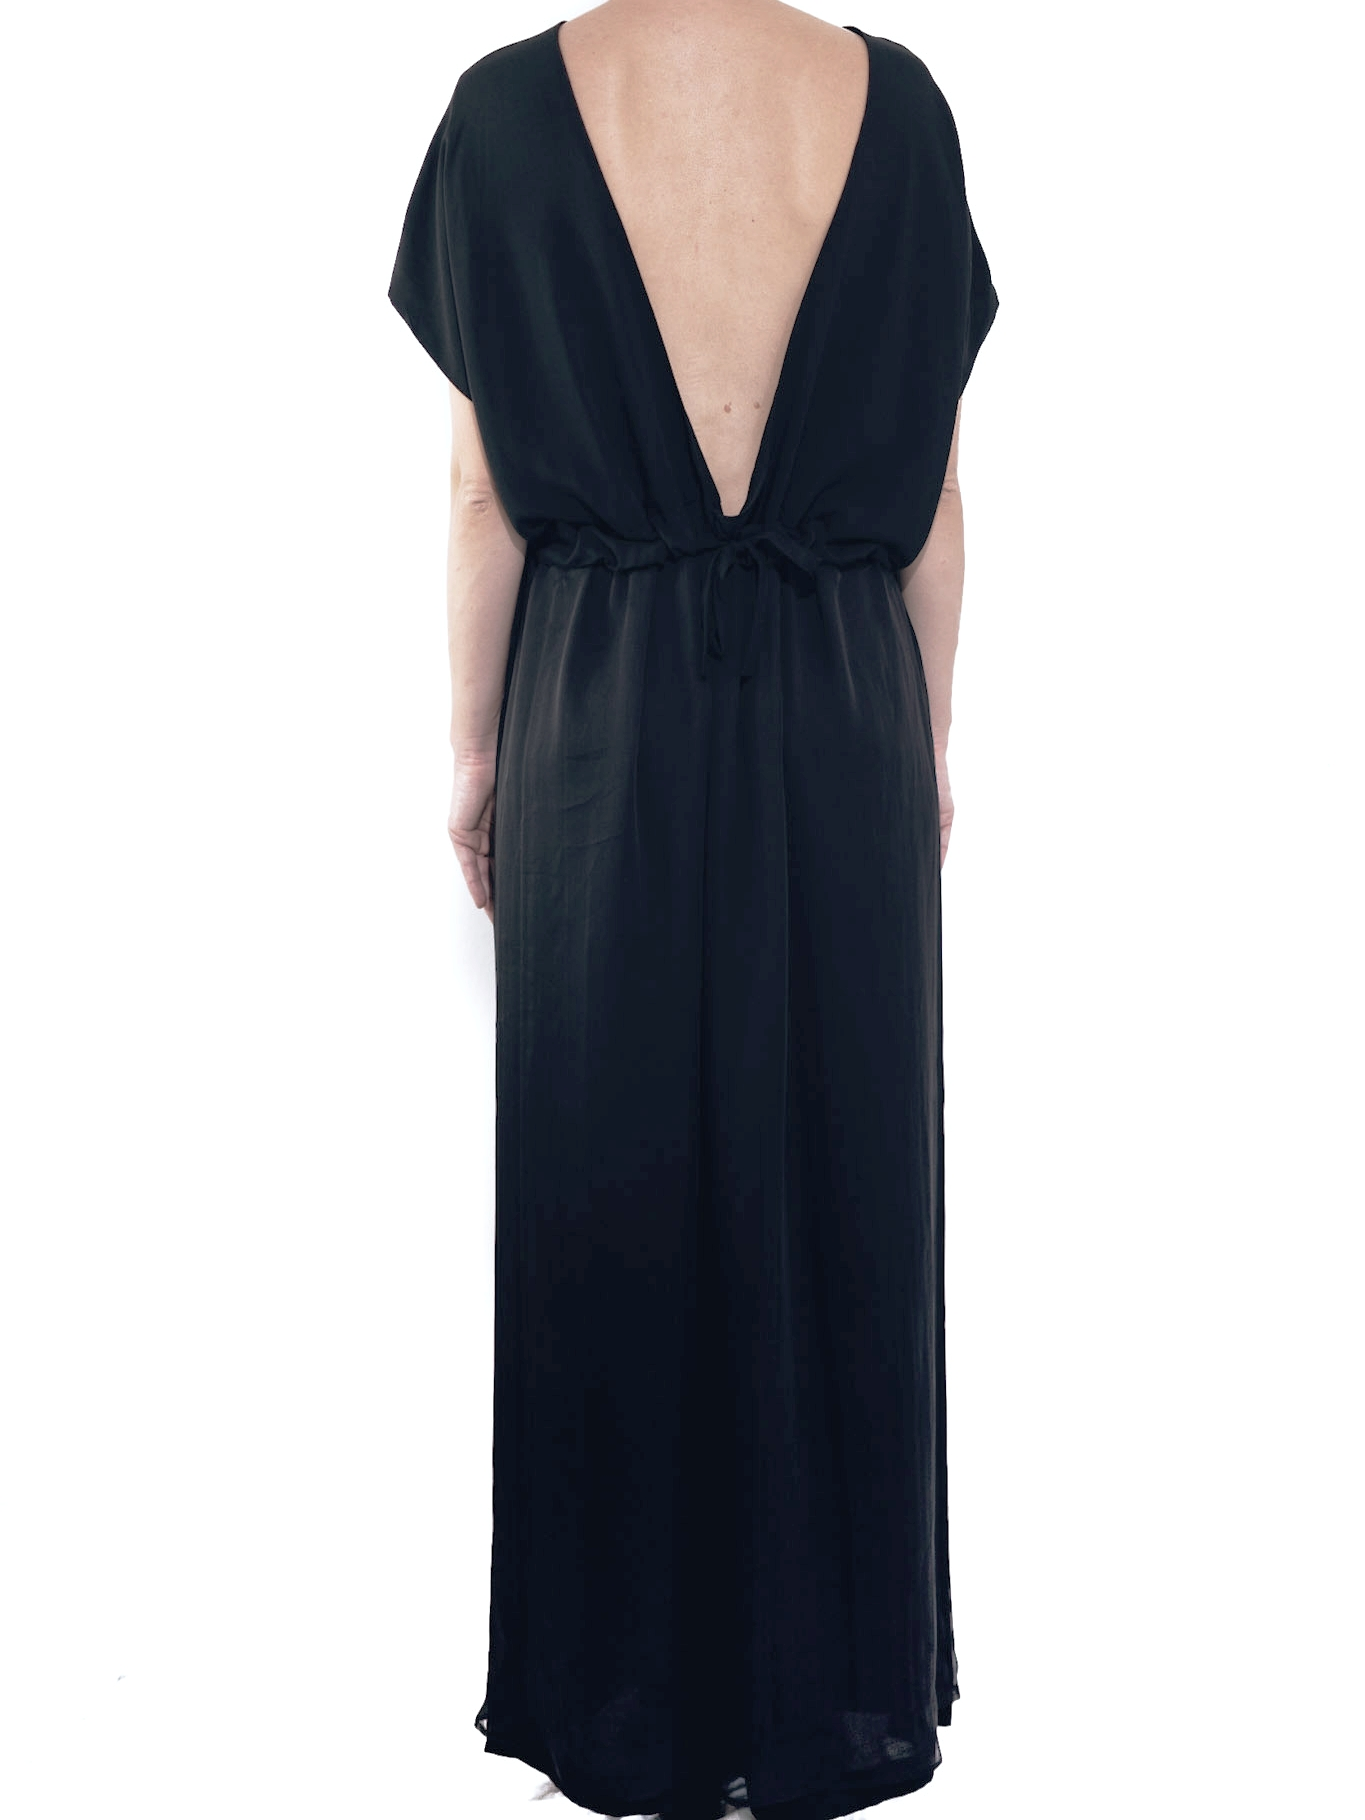 19.0.16 - DRESS : LARGE  FABRIC: 100% VISCOSE & 100% SILK  SIZE: U  COLOR: BLACK / BLACK & WHITE